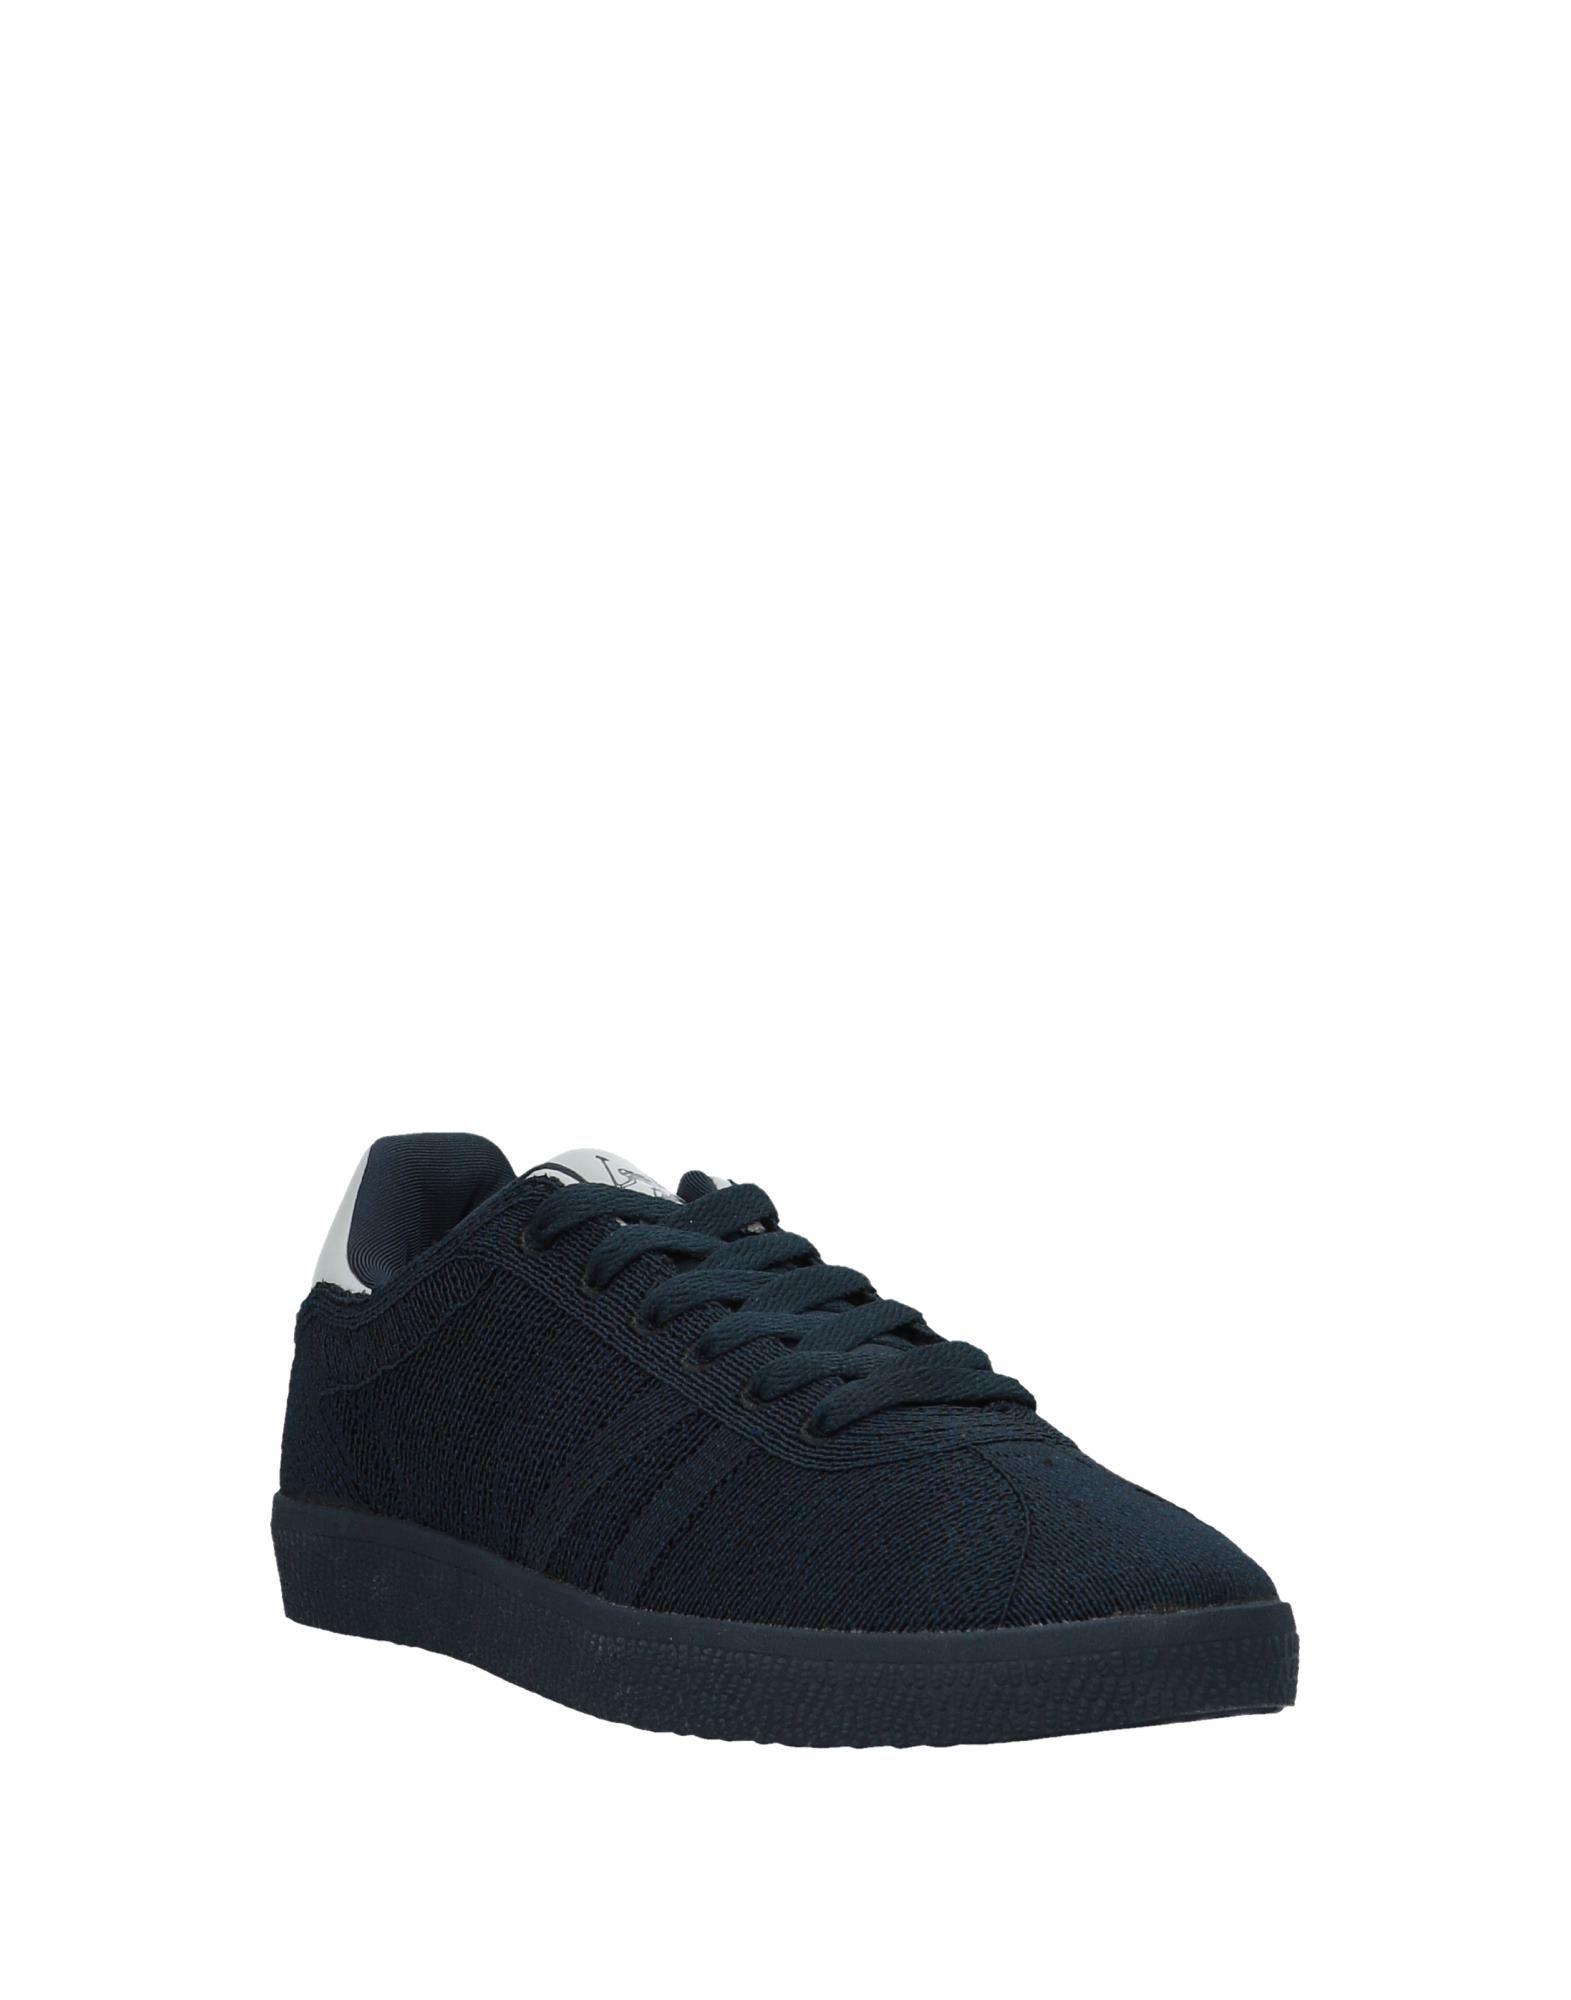 Rabatt echte 11544583HO Schuhe U.S.Polo Assn. Sneakers Herren  11544583HO echte de6d65